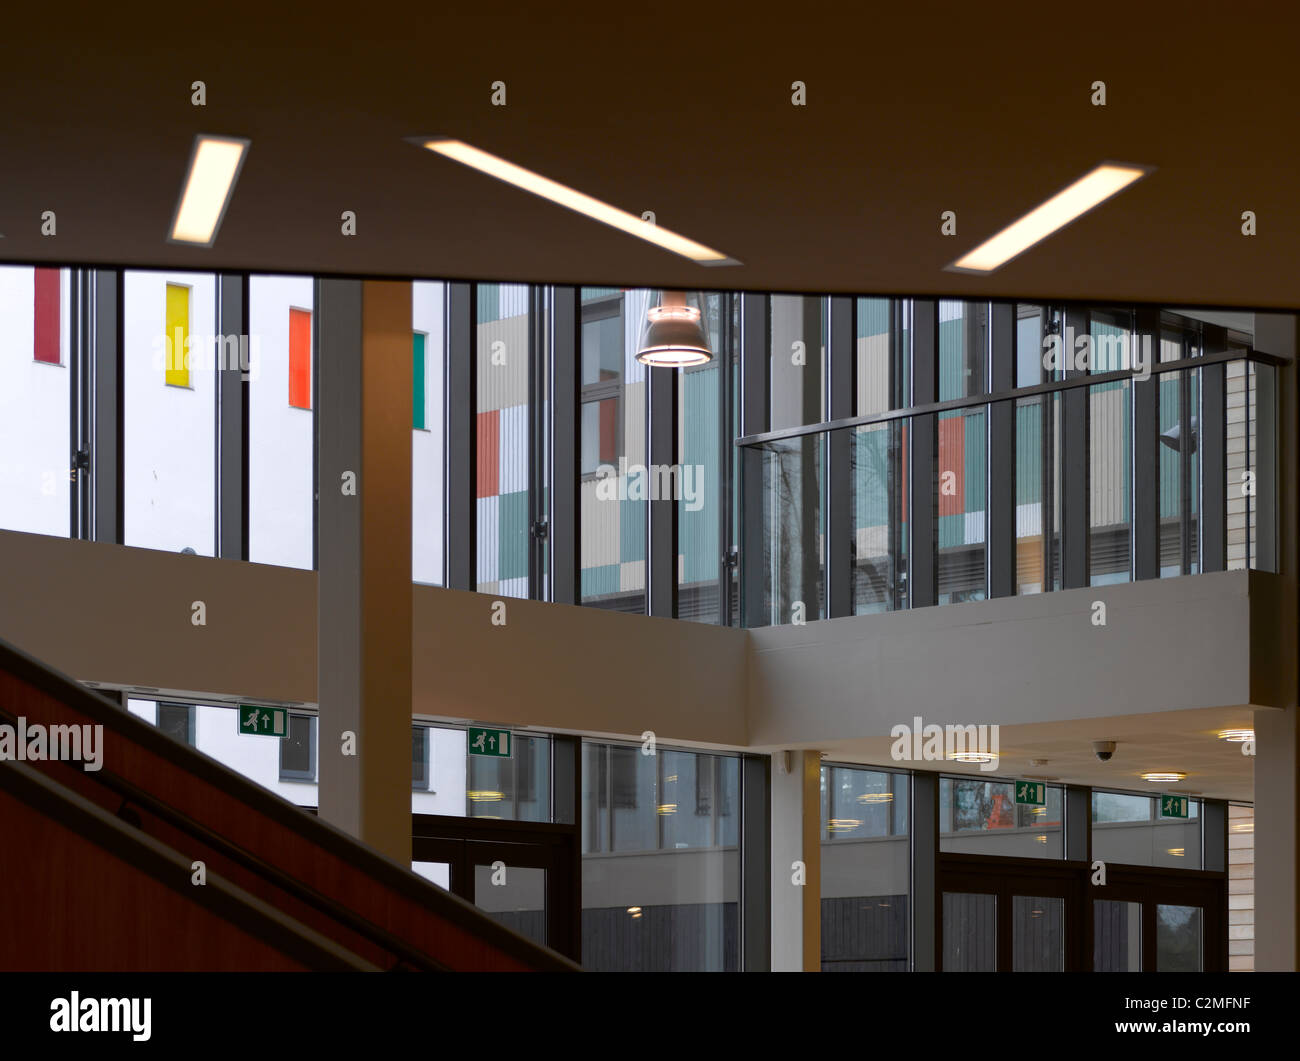 MAC, Formerly Midlands Art Centre, Birmingham - Stock Image